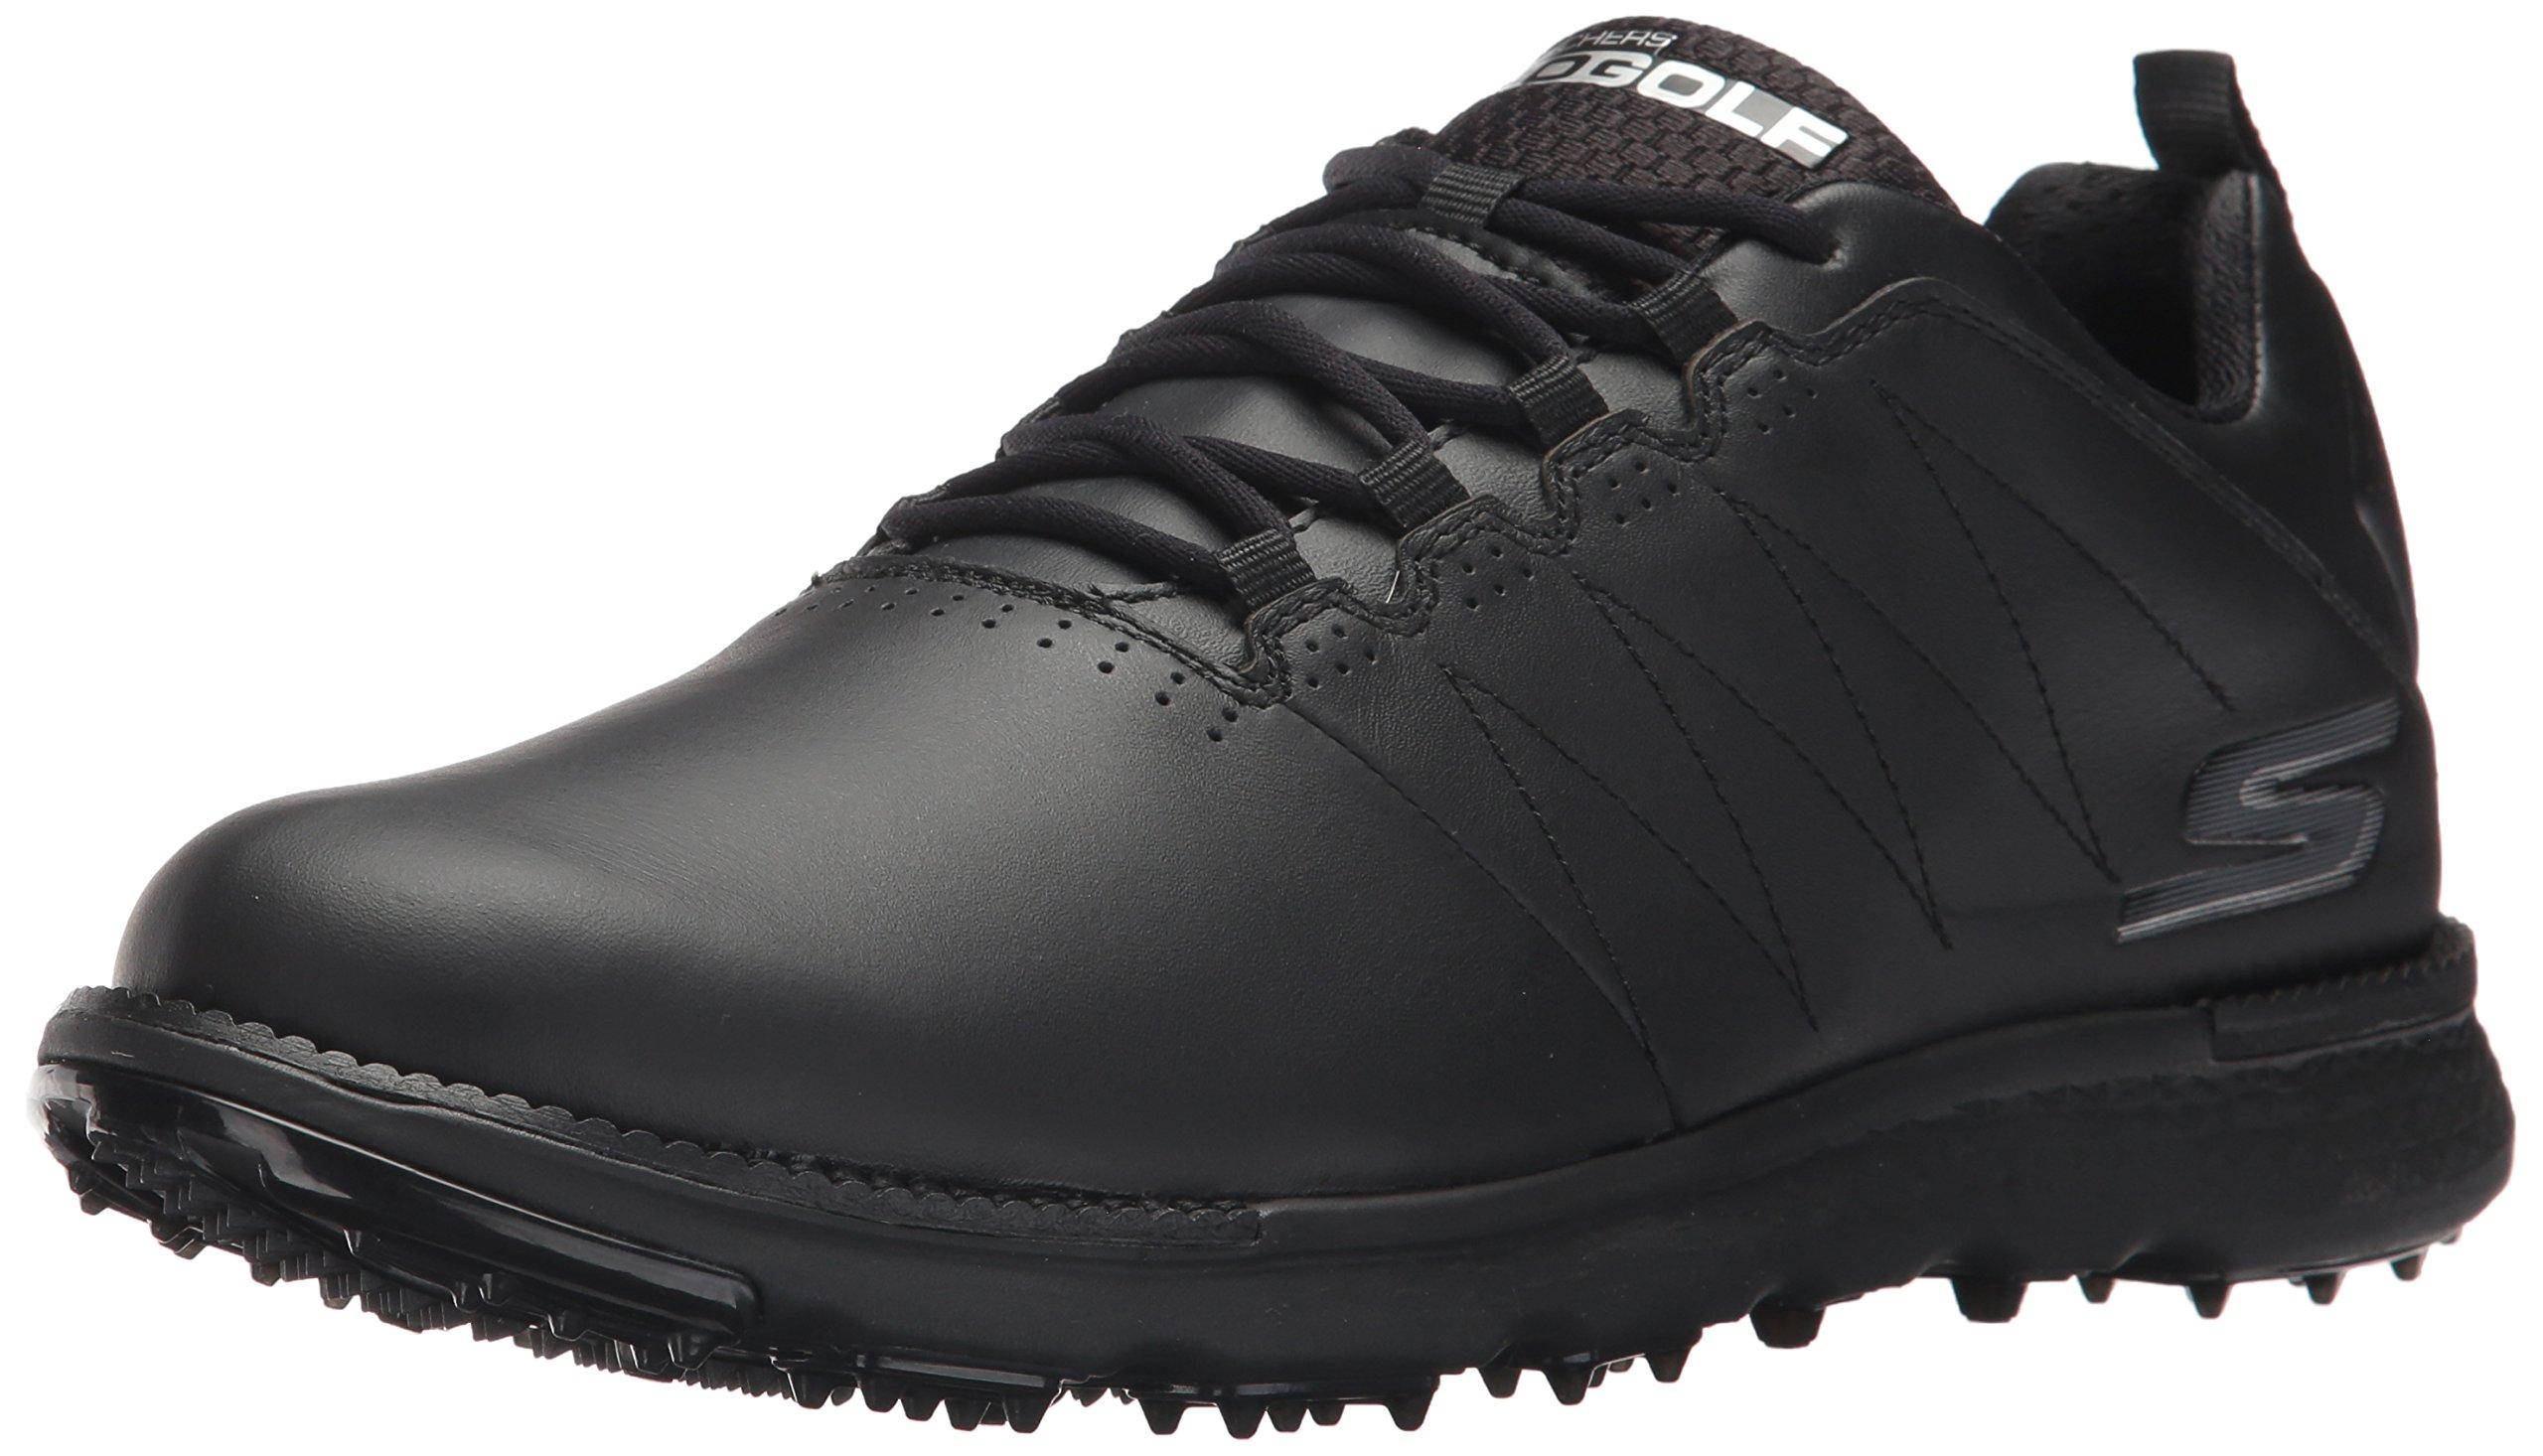 Skechers Performance Men's Go Golf Elite 3 Golf Shoe,Black,8.5 M US